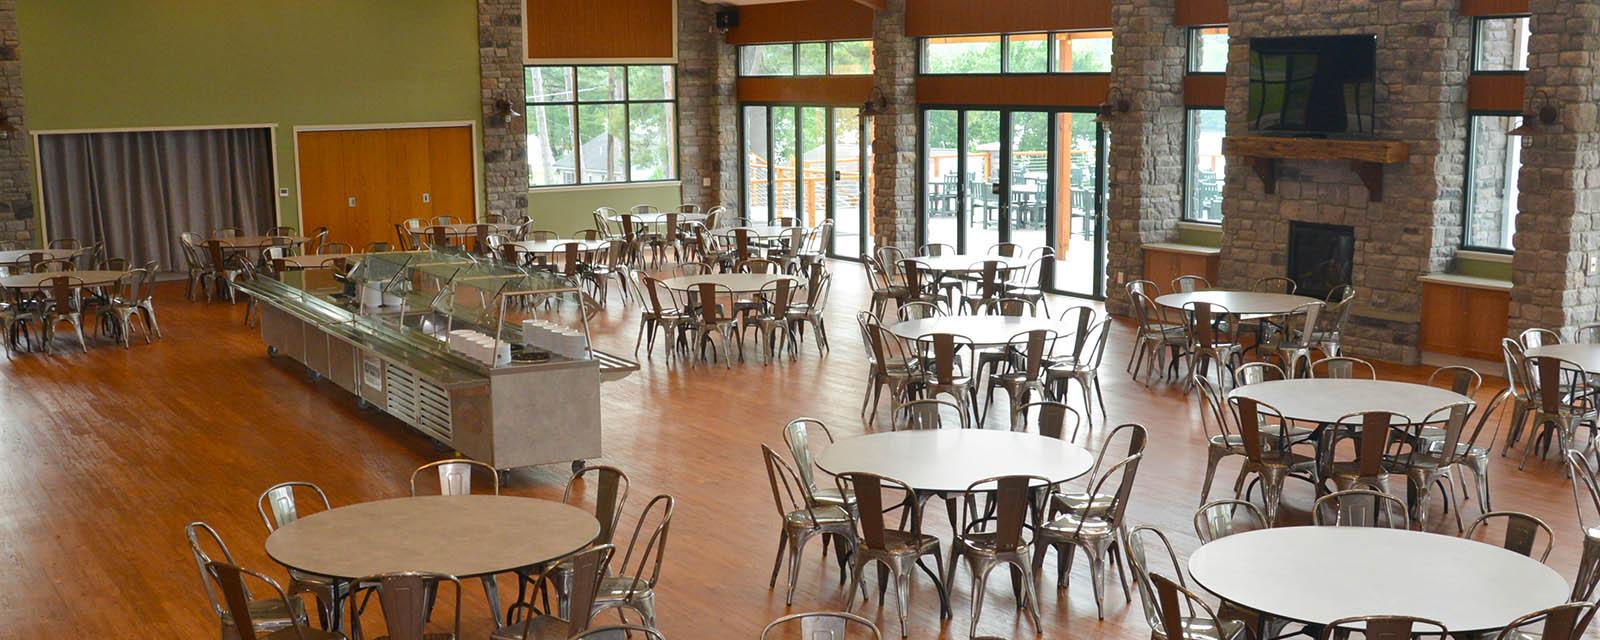 dining room at Trout Lake Resorts